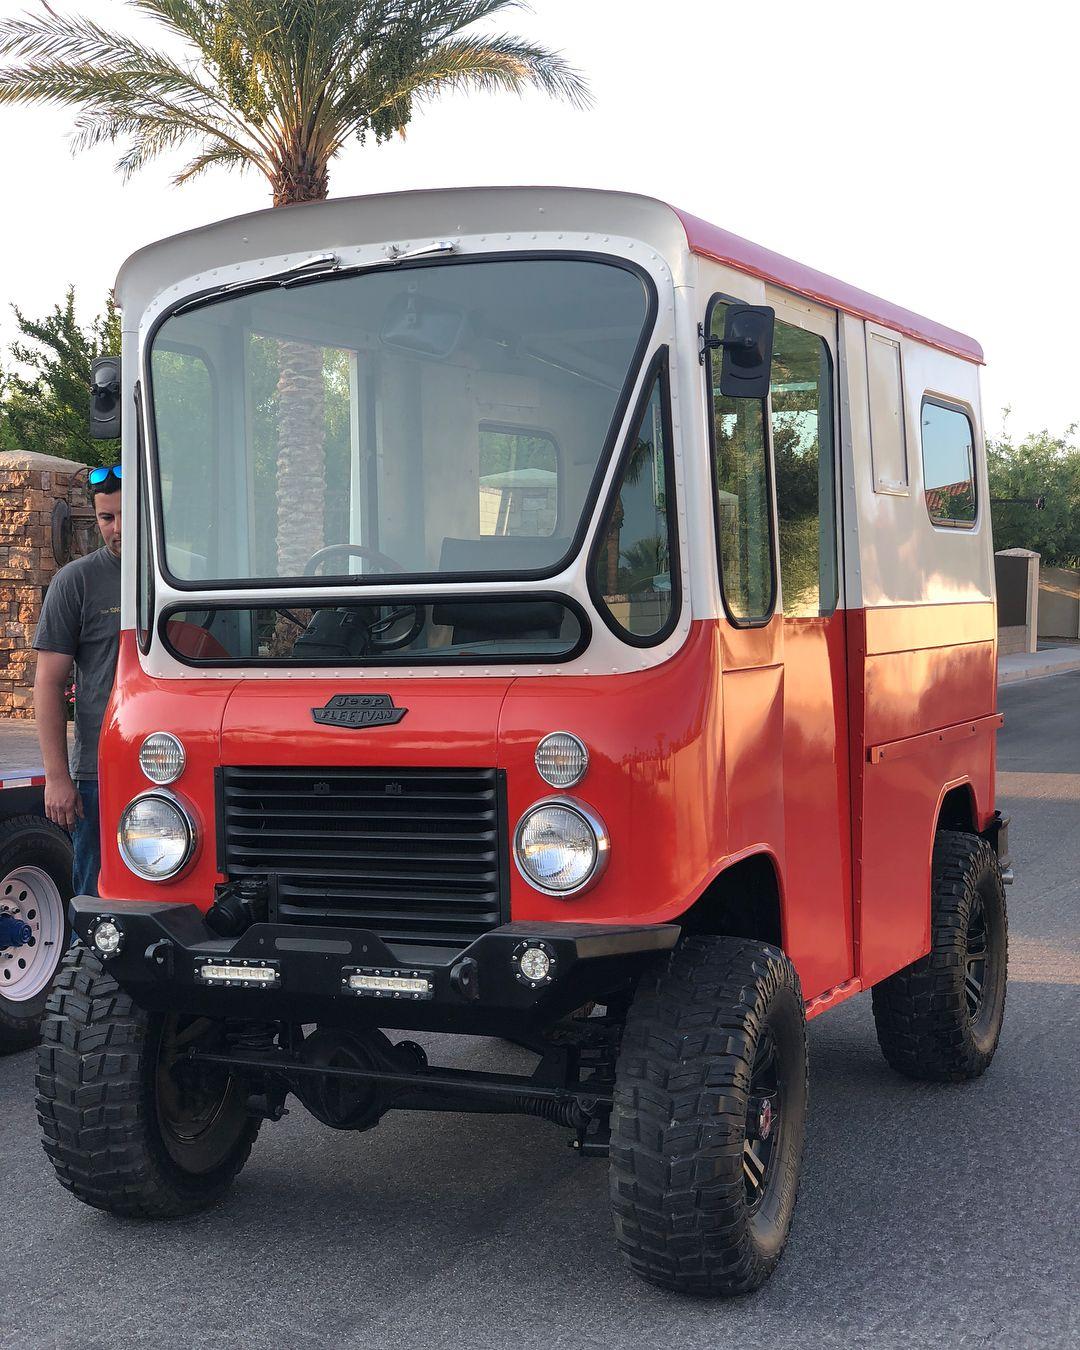 Jeep, Jeep Concept, Rock Crawler